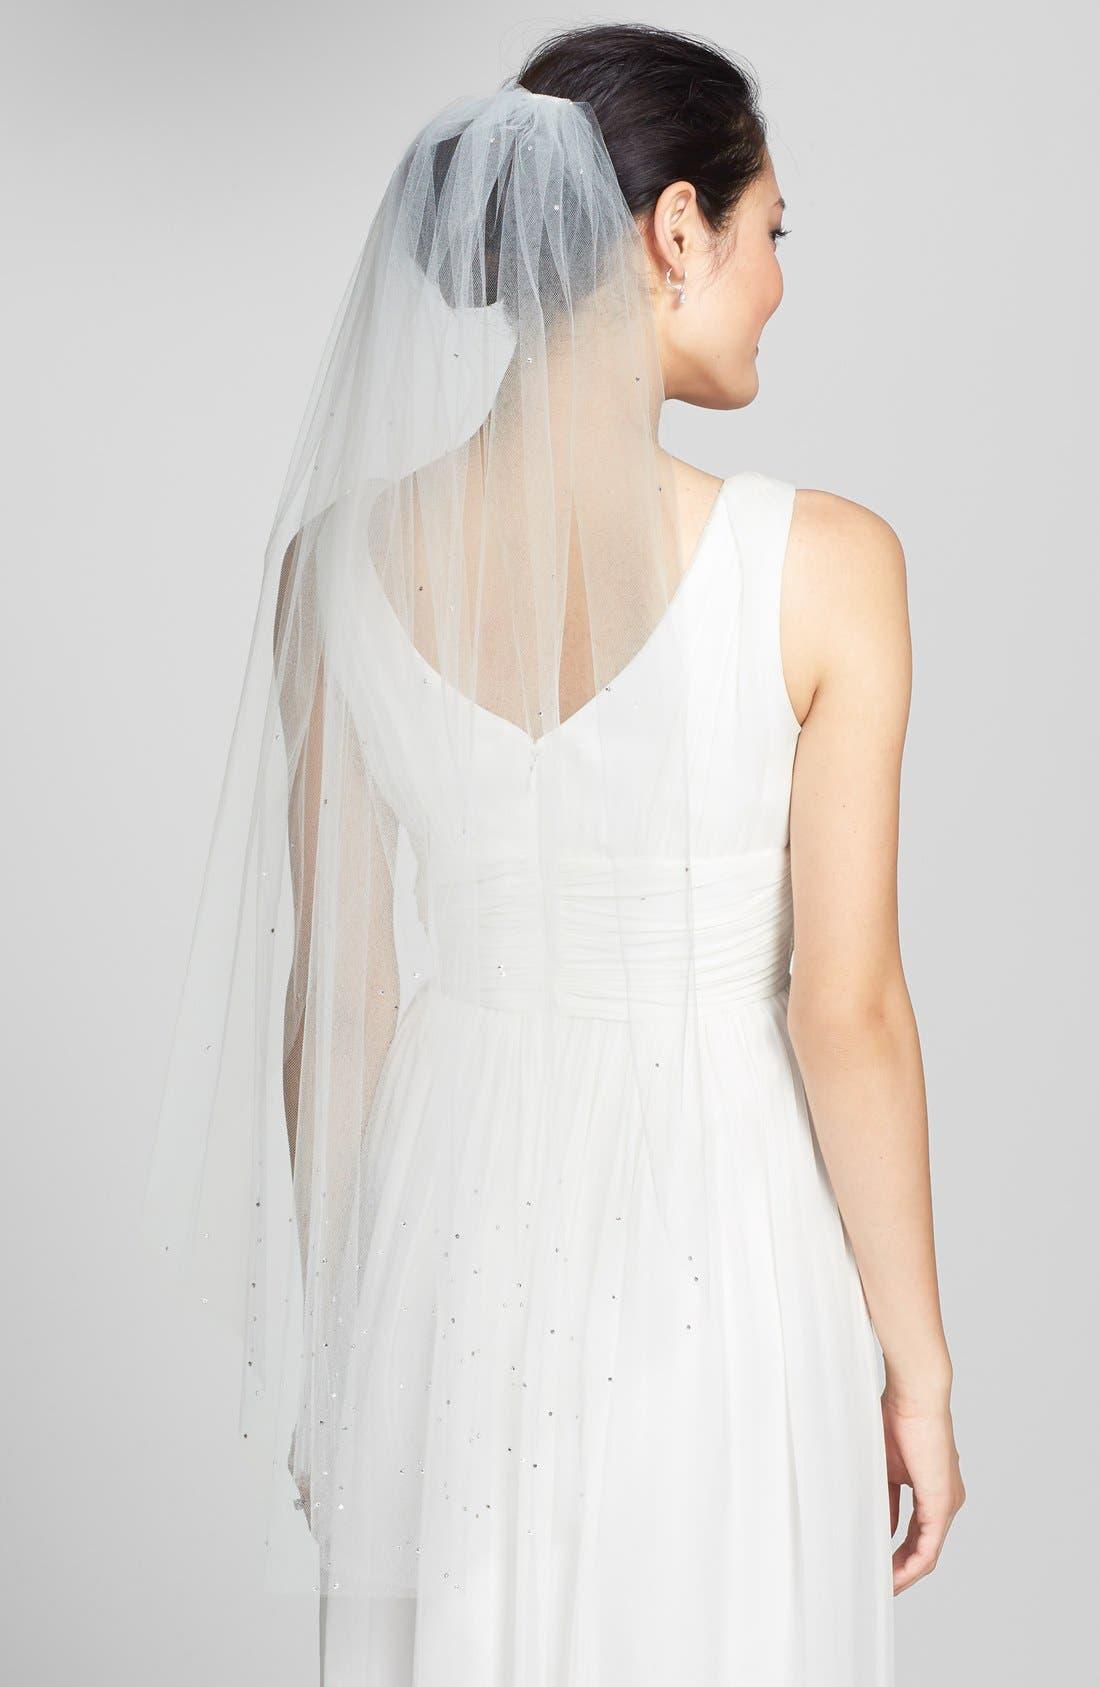 Main Image - Veil Trends 'Amethyst' Single Layer Fingertip Veil